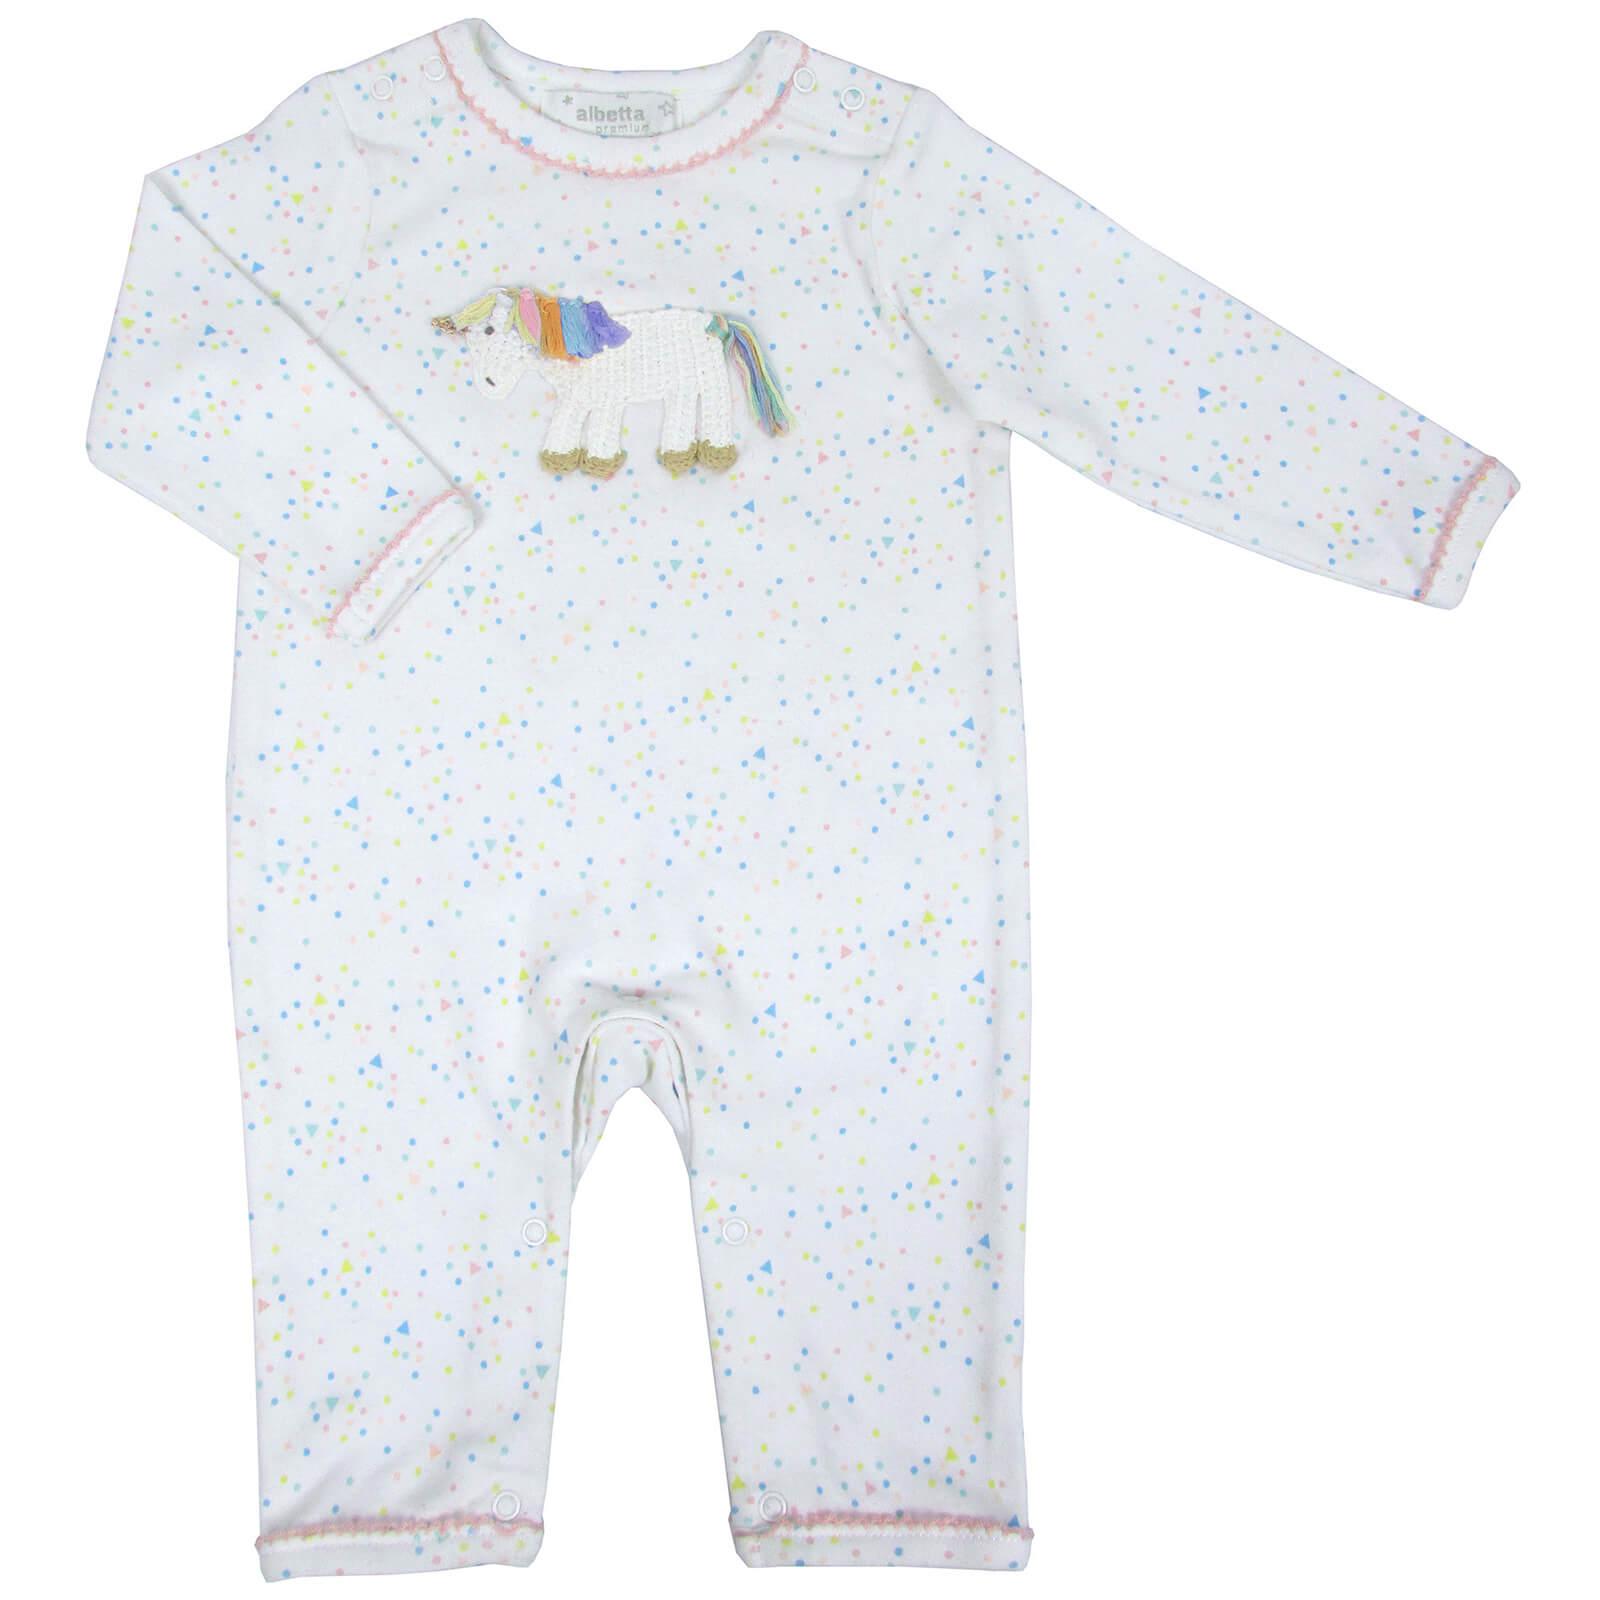 b5d541fe4 Albetta Crochet Rainbow Unicorn Babygrow - 0-3 Months Clothing ...